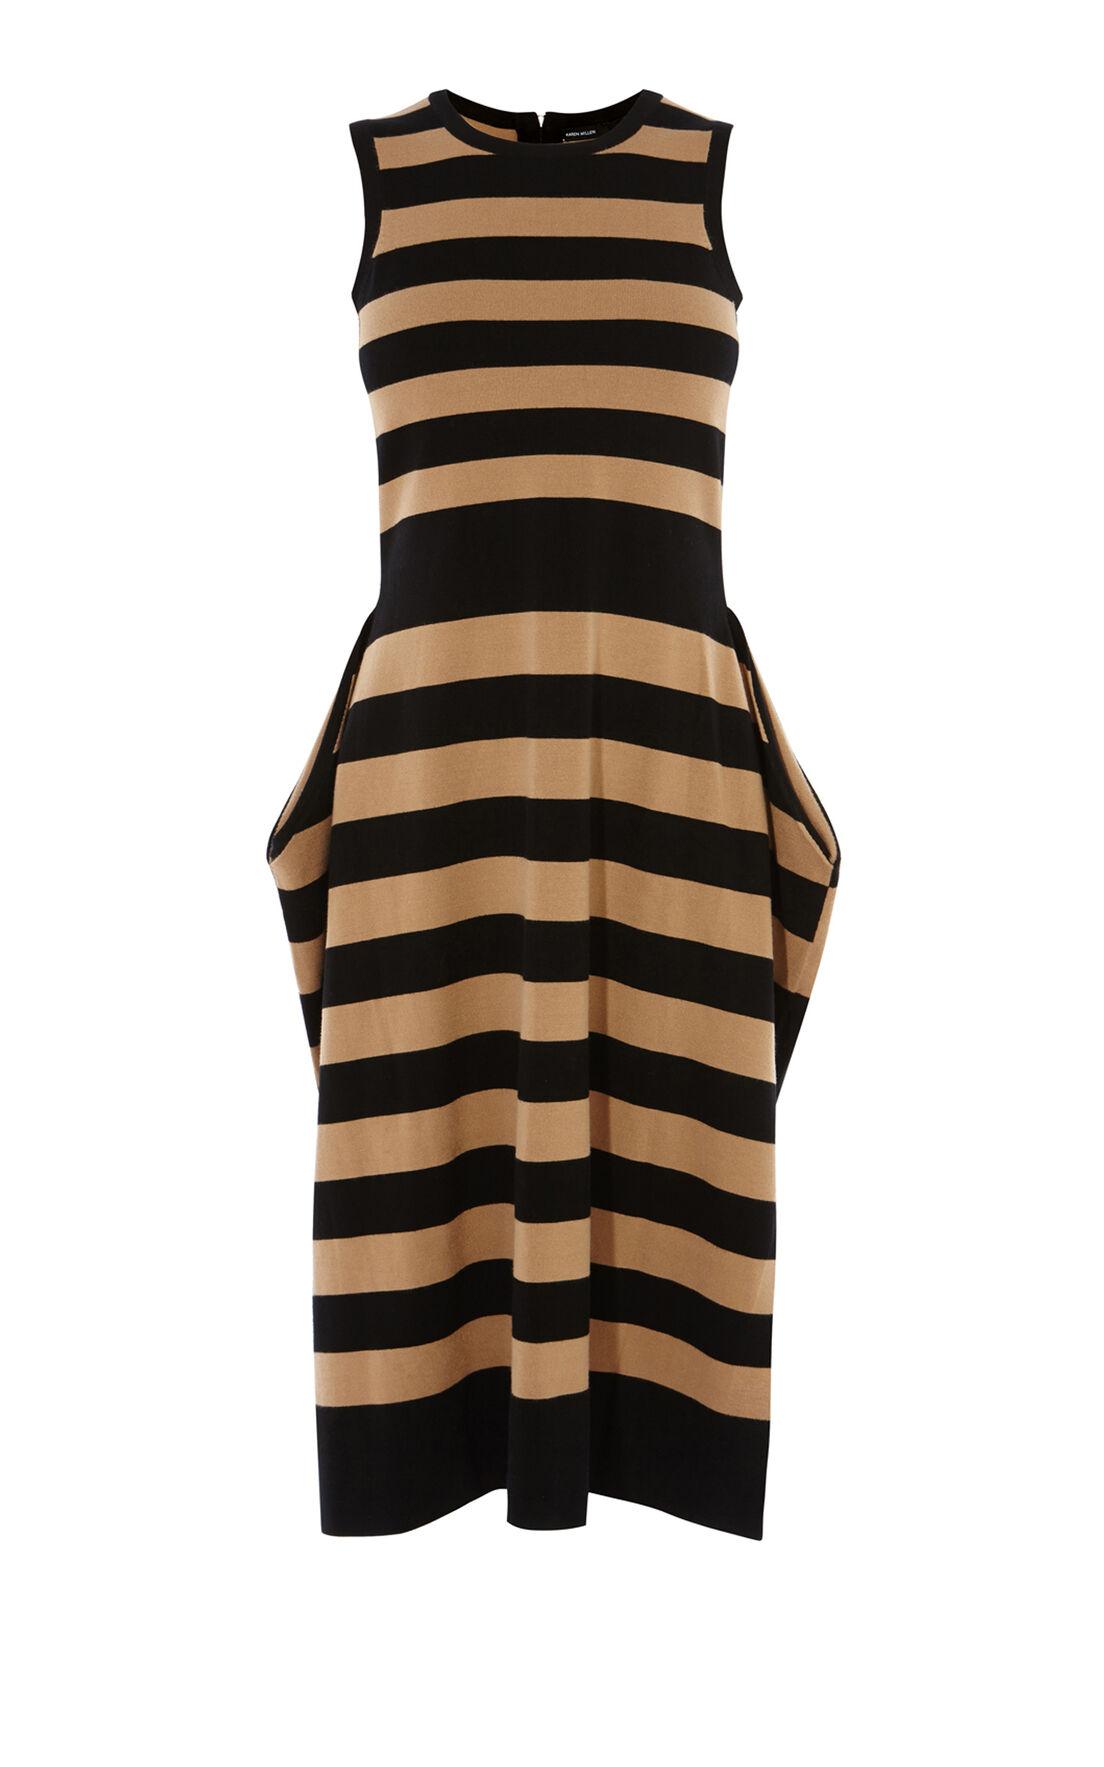 Karen Millen, STRIPED KNIT DRESS Blk/Multi 0